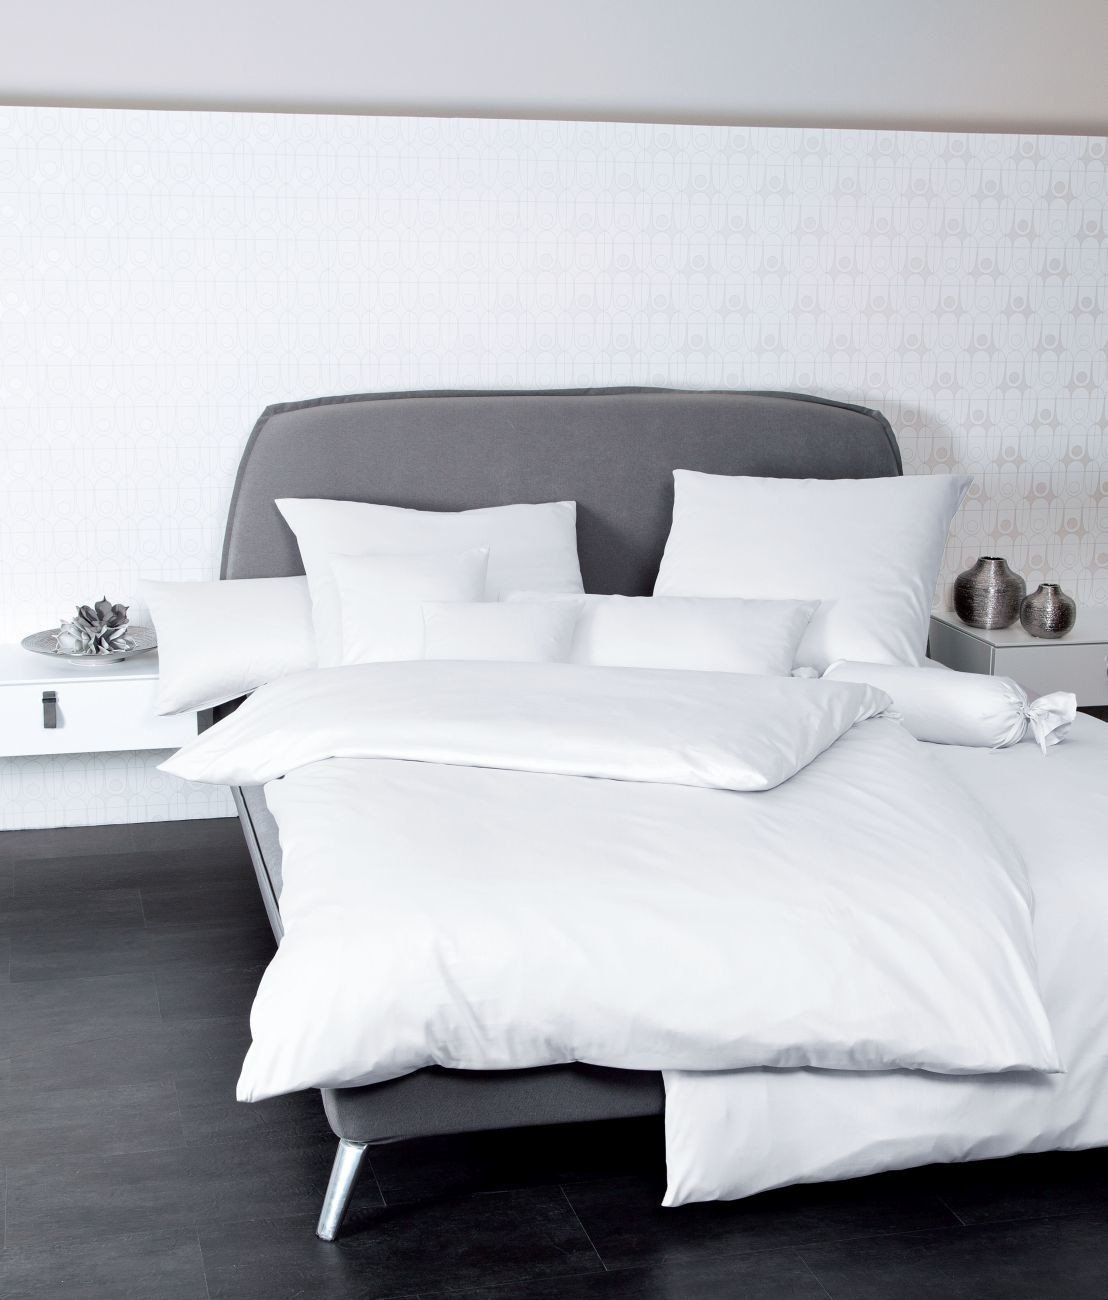 Janine Bettwäsche UNI 100% BW Mako-Satin 31001-10 Weiß 200x220 + 2x 80x80 cm